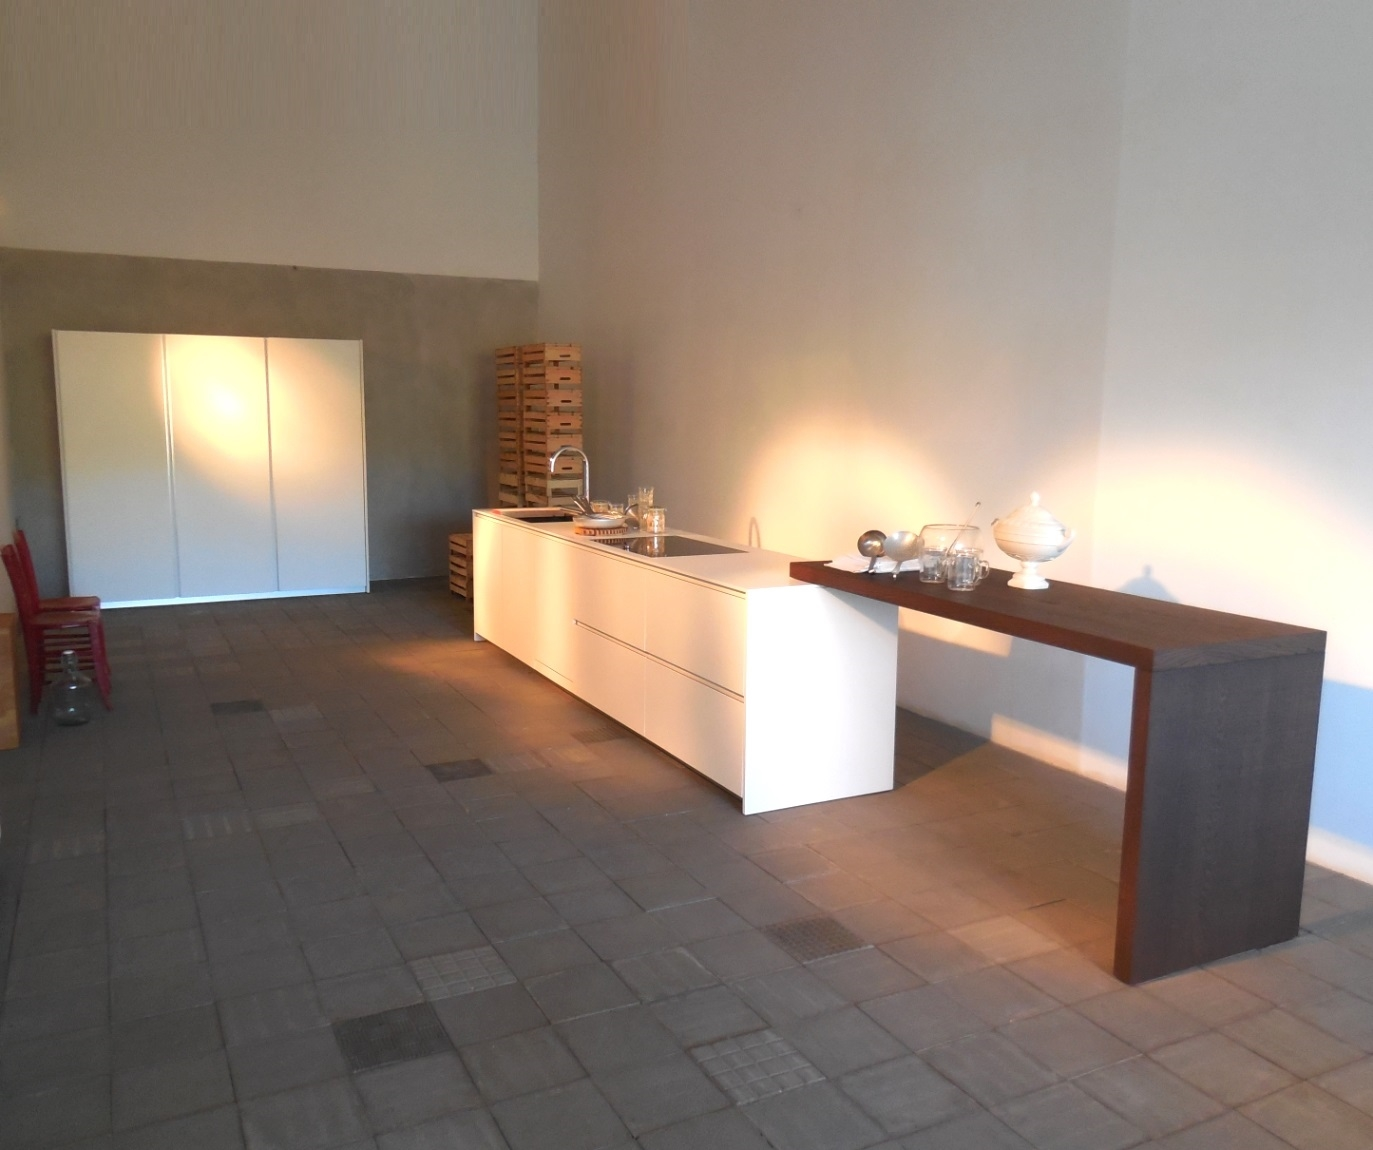 Modulnova Cucine Piano Per Penisola In Appoggio A Top Cucine O  #9C622F 1373 1150 Veneta Cucine O Modulnova